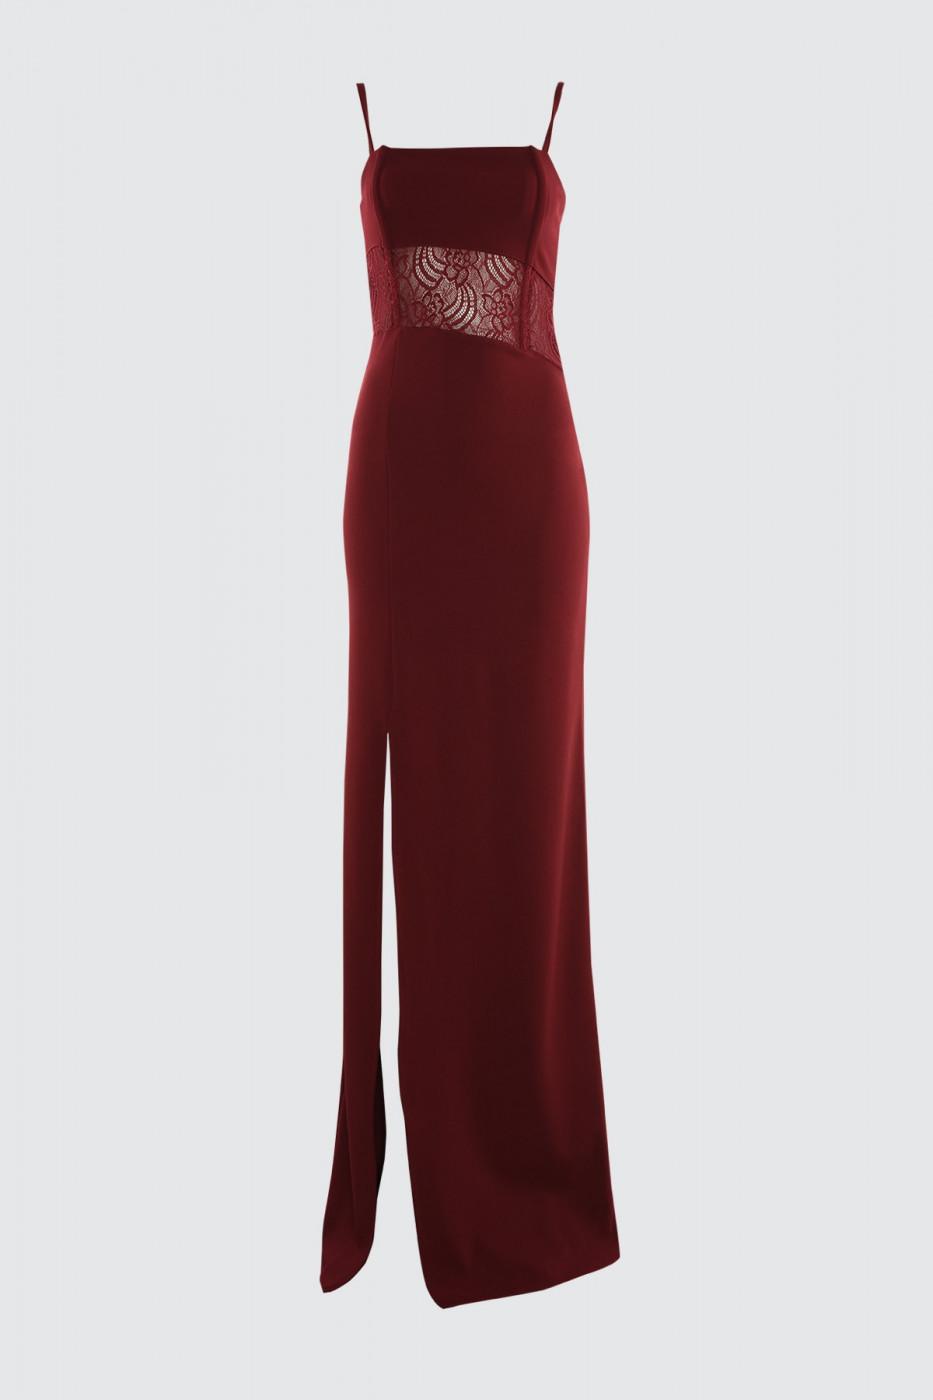 Trendyol Burgundy Lace Detailed Balenli Evening Dress & Graduation Dress